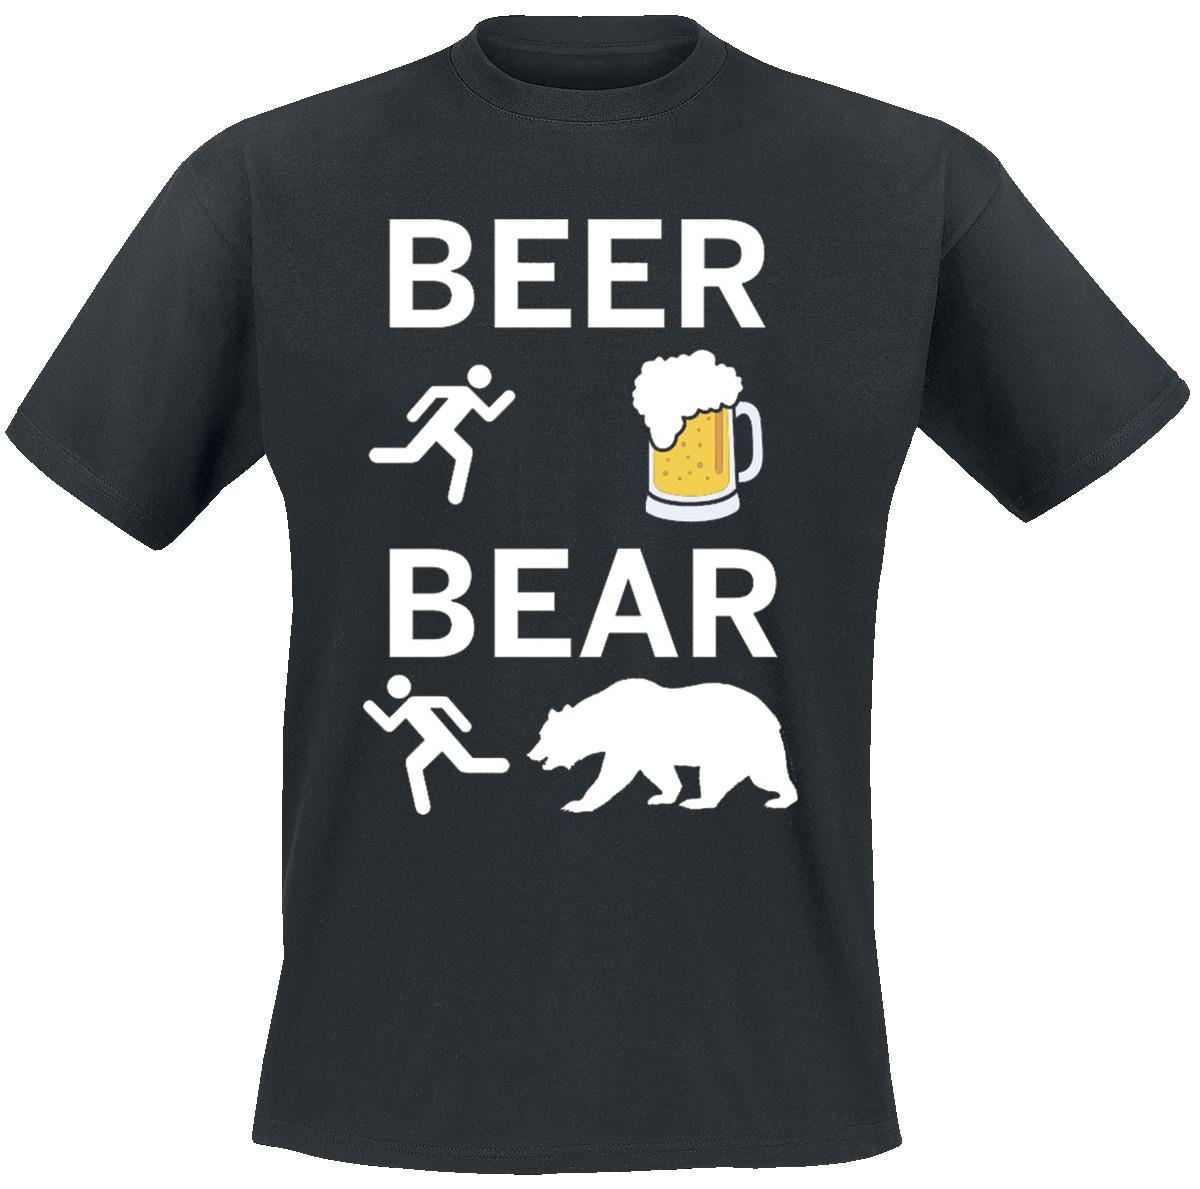 Beer - Bear - - T-Shirt - black